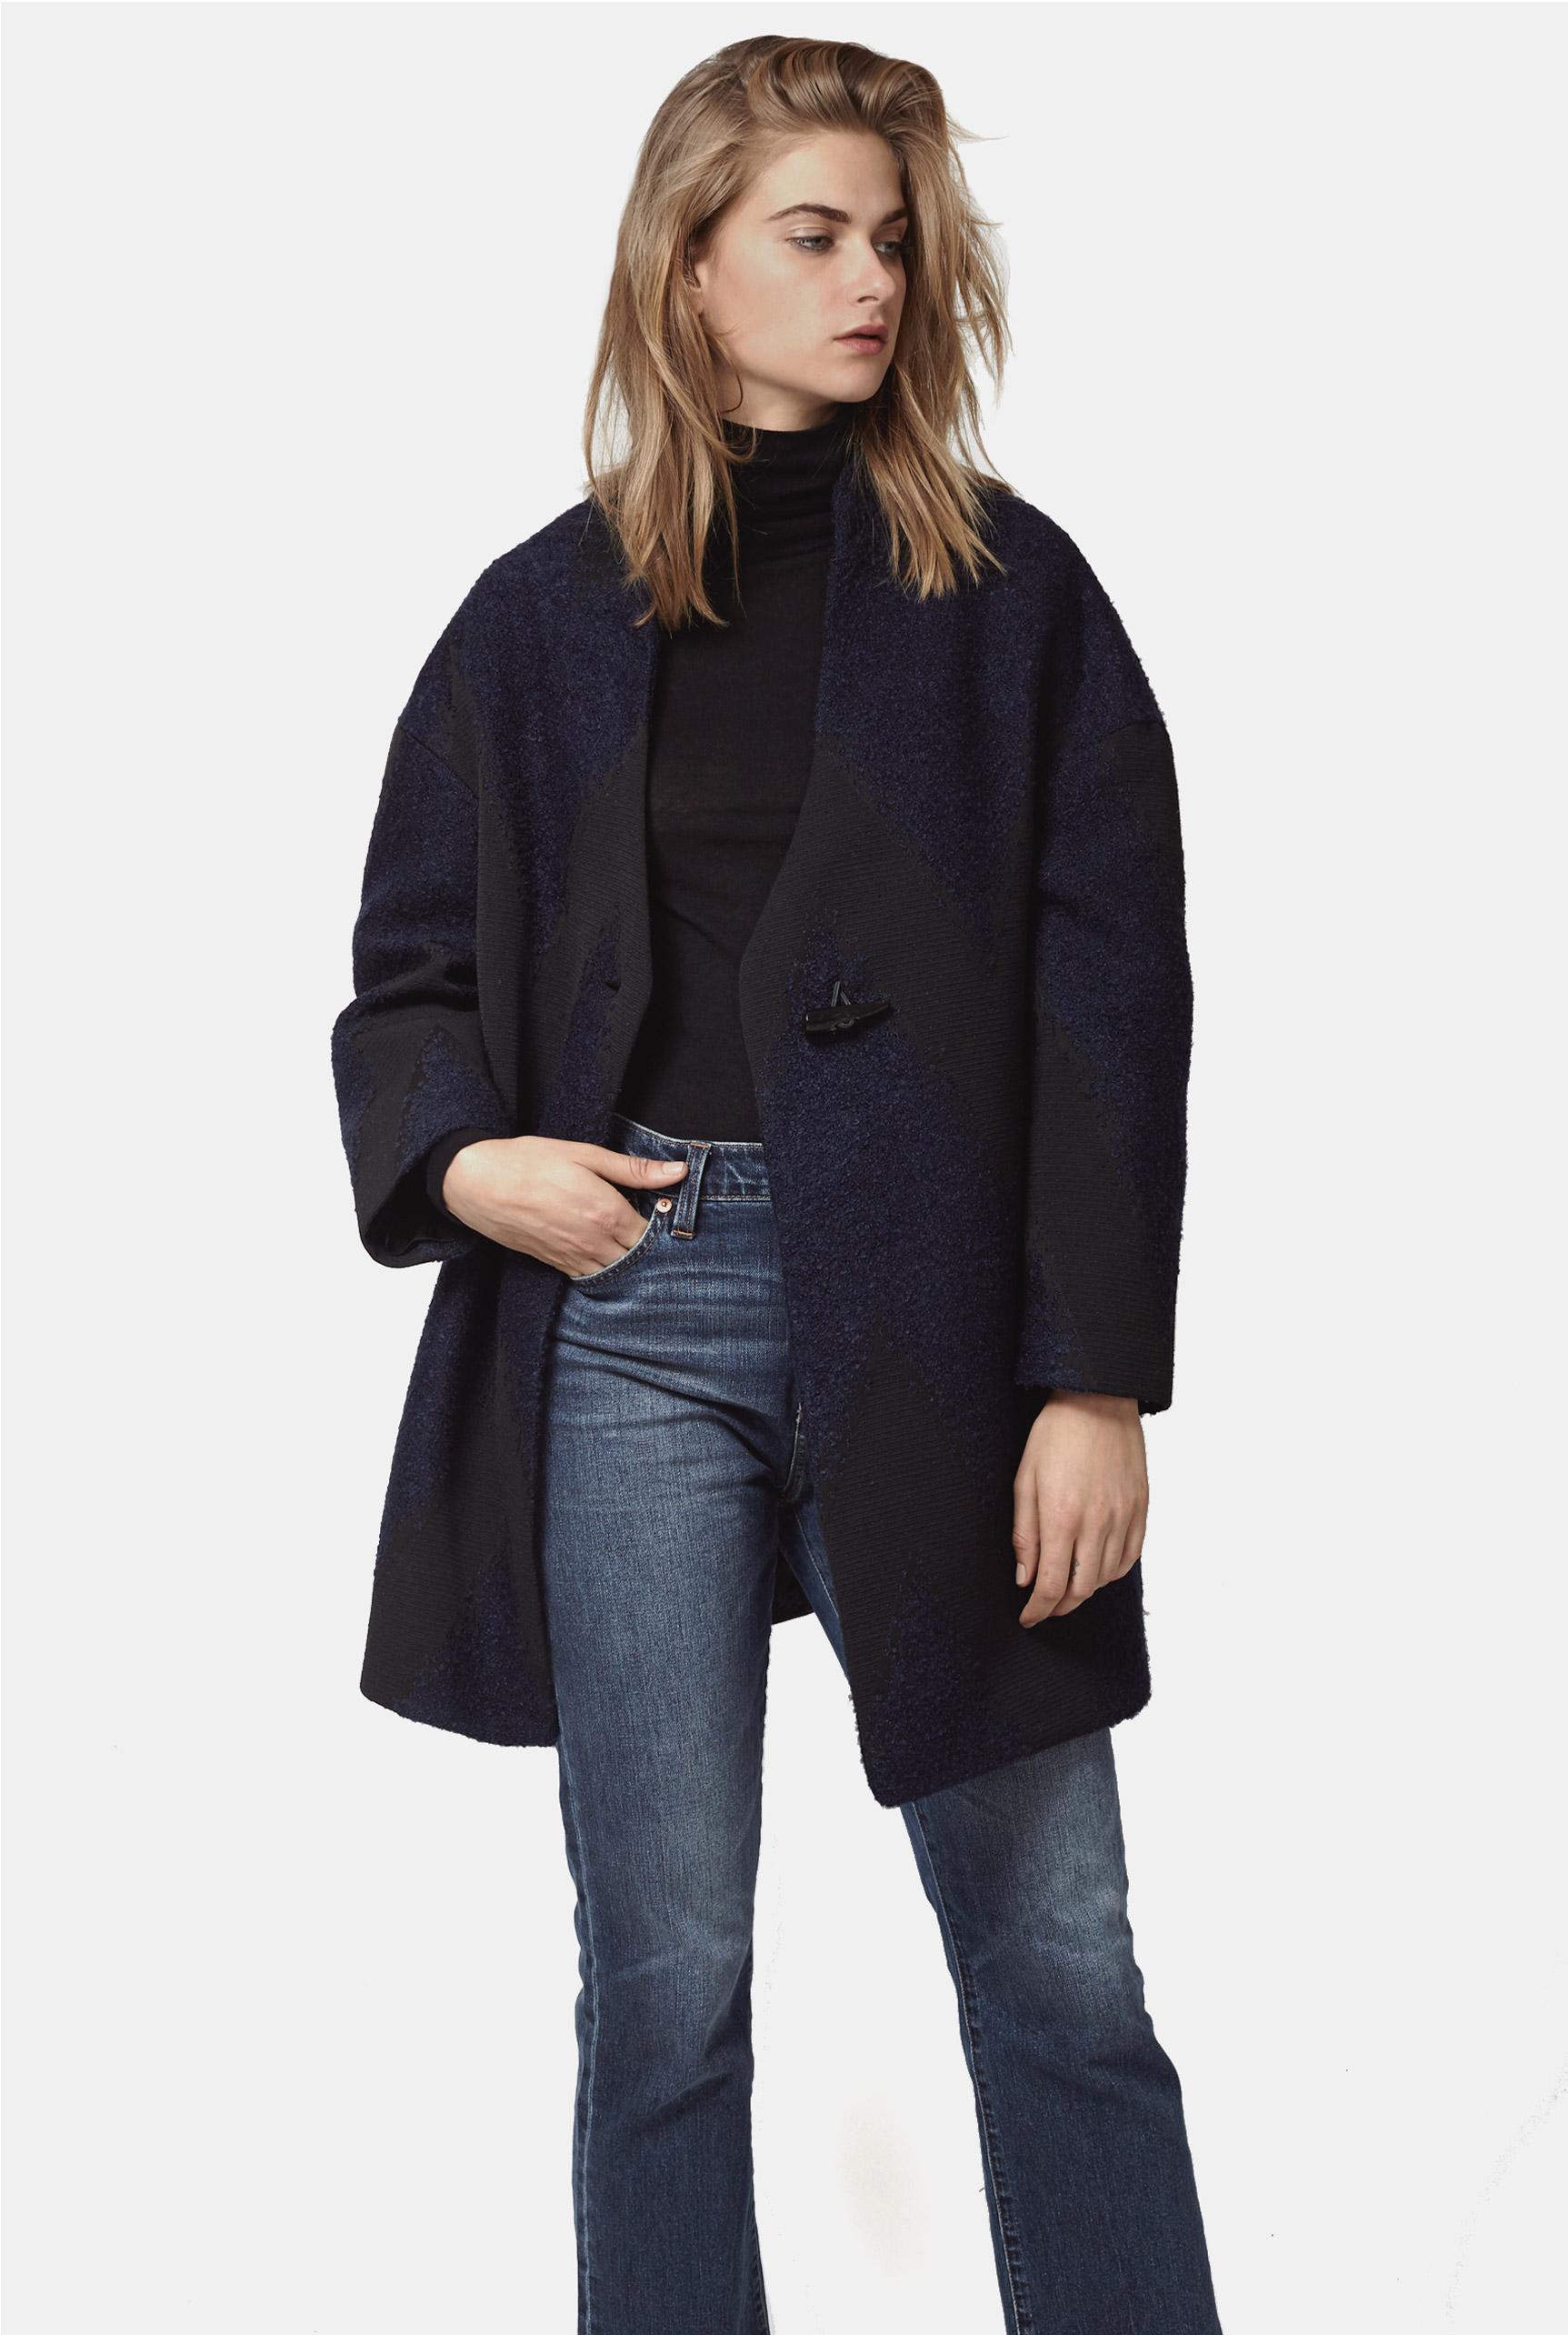 PINE jacket